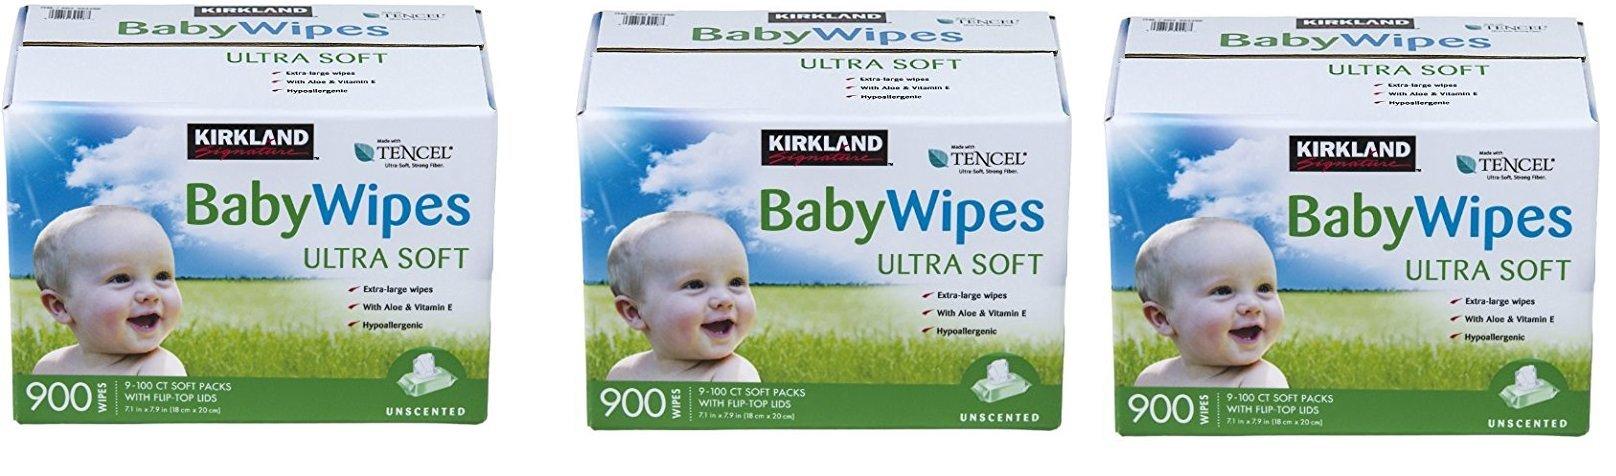 Kirkland Signature Baby Wipes, zKixFp, 3 Boxes of 900 Wipes